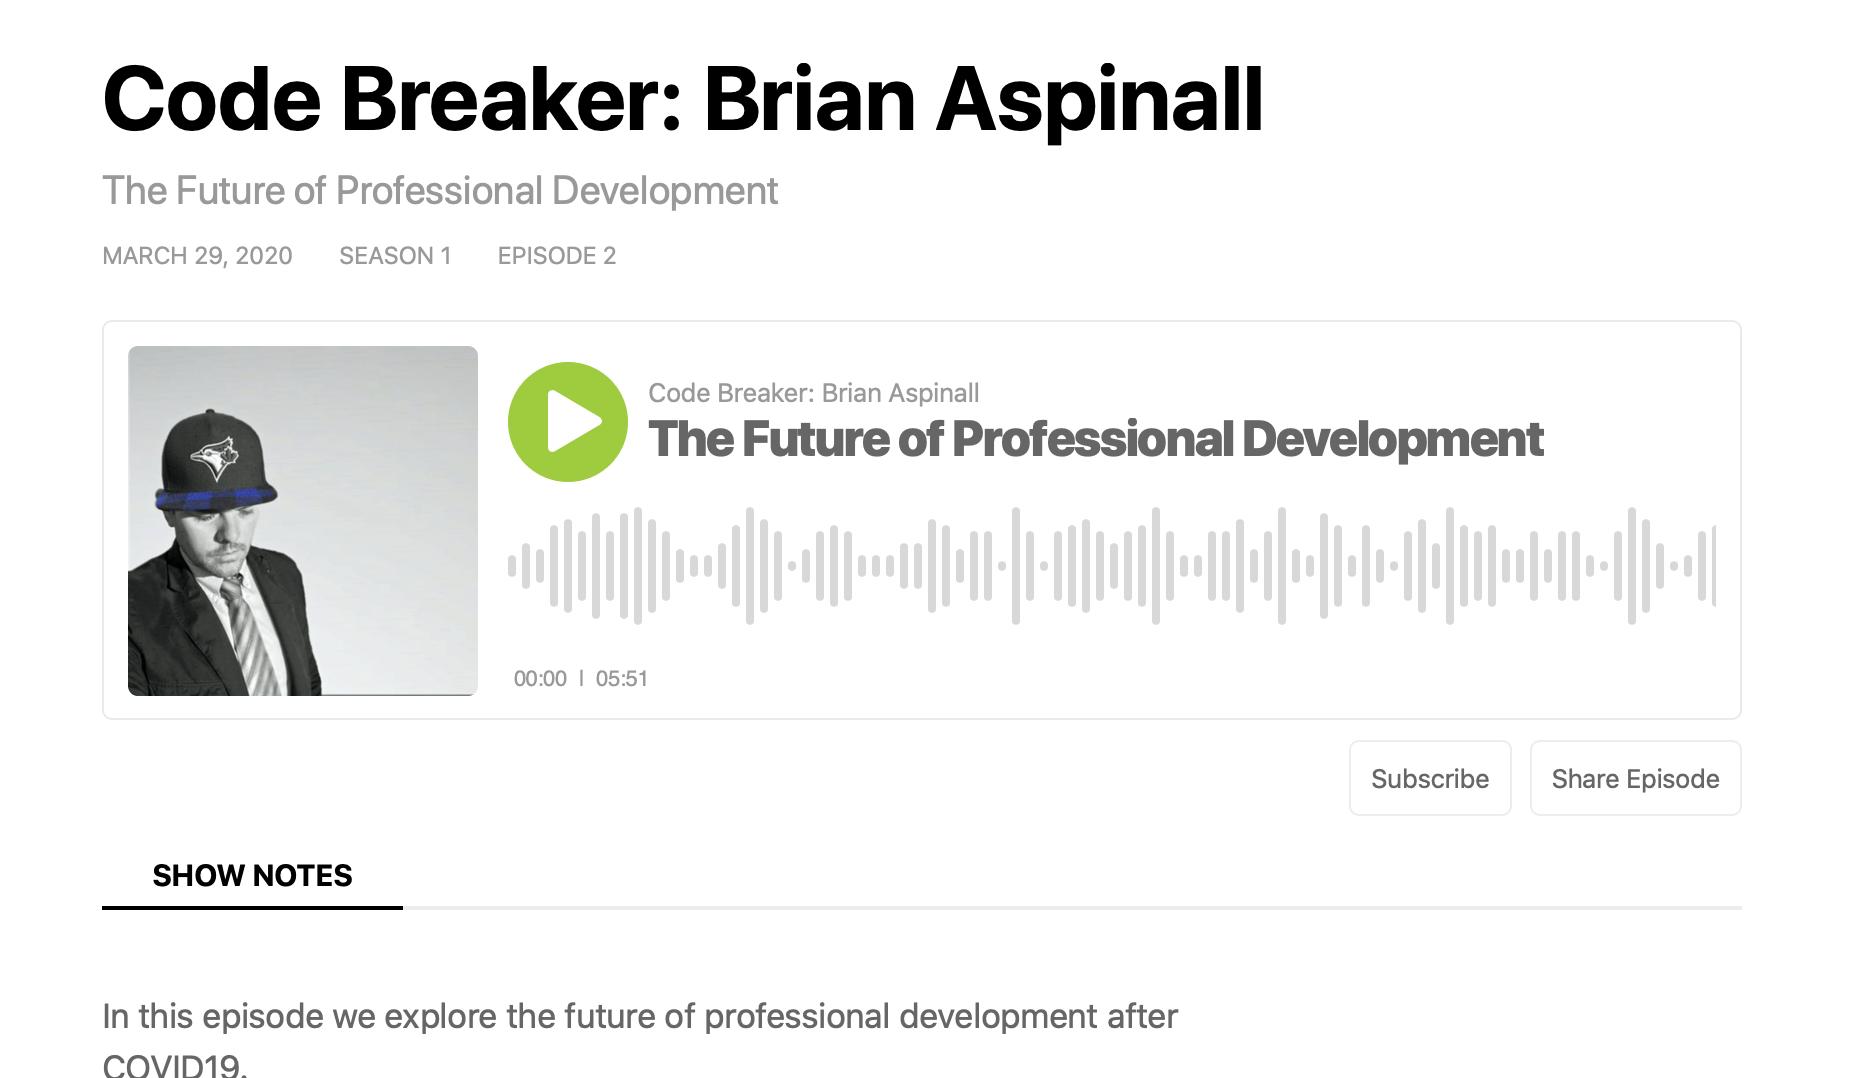 The Future of Professional Development: Podcast